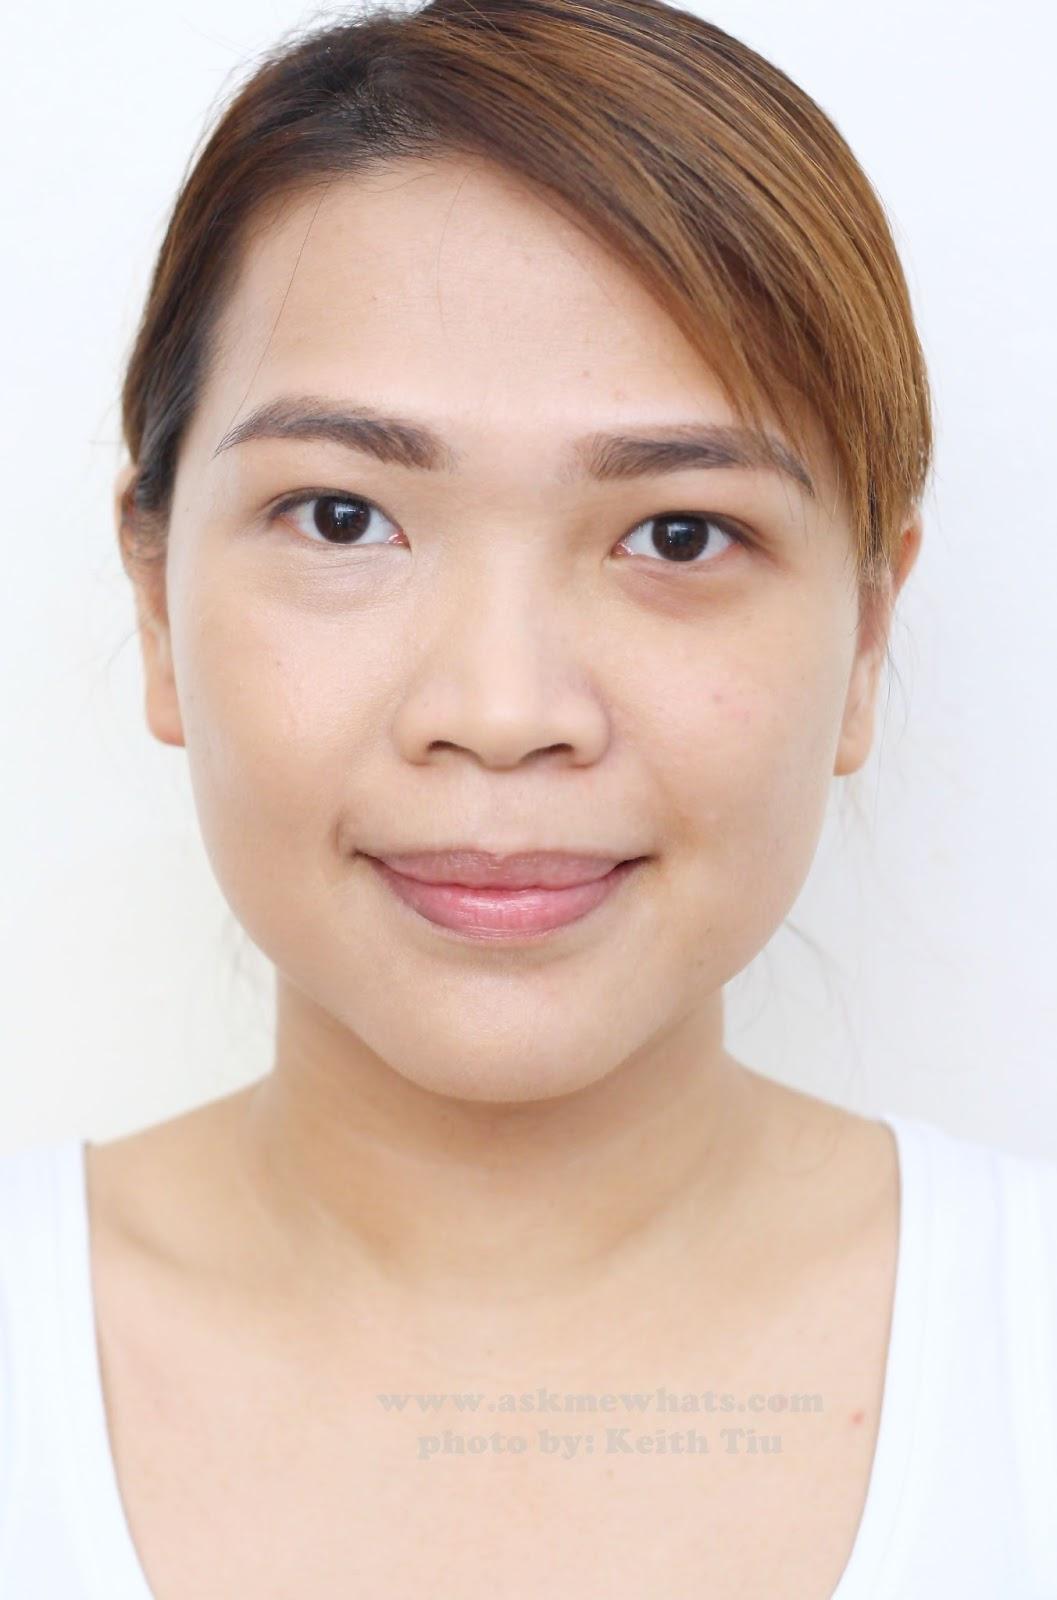 Bikini hair laser photo removal